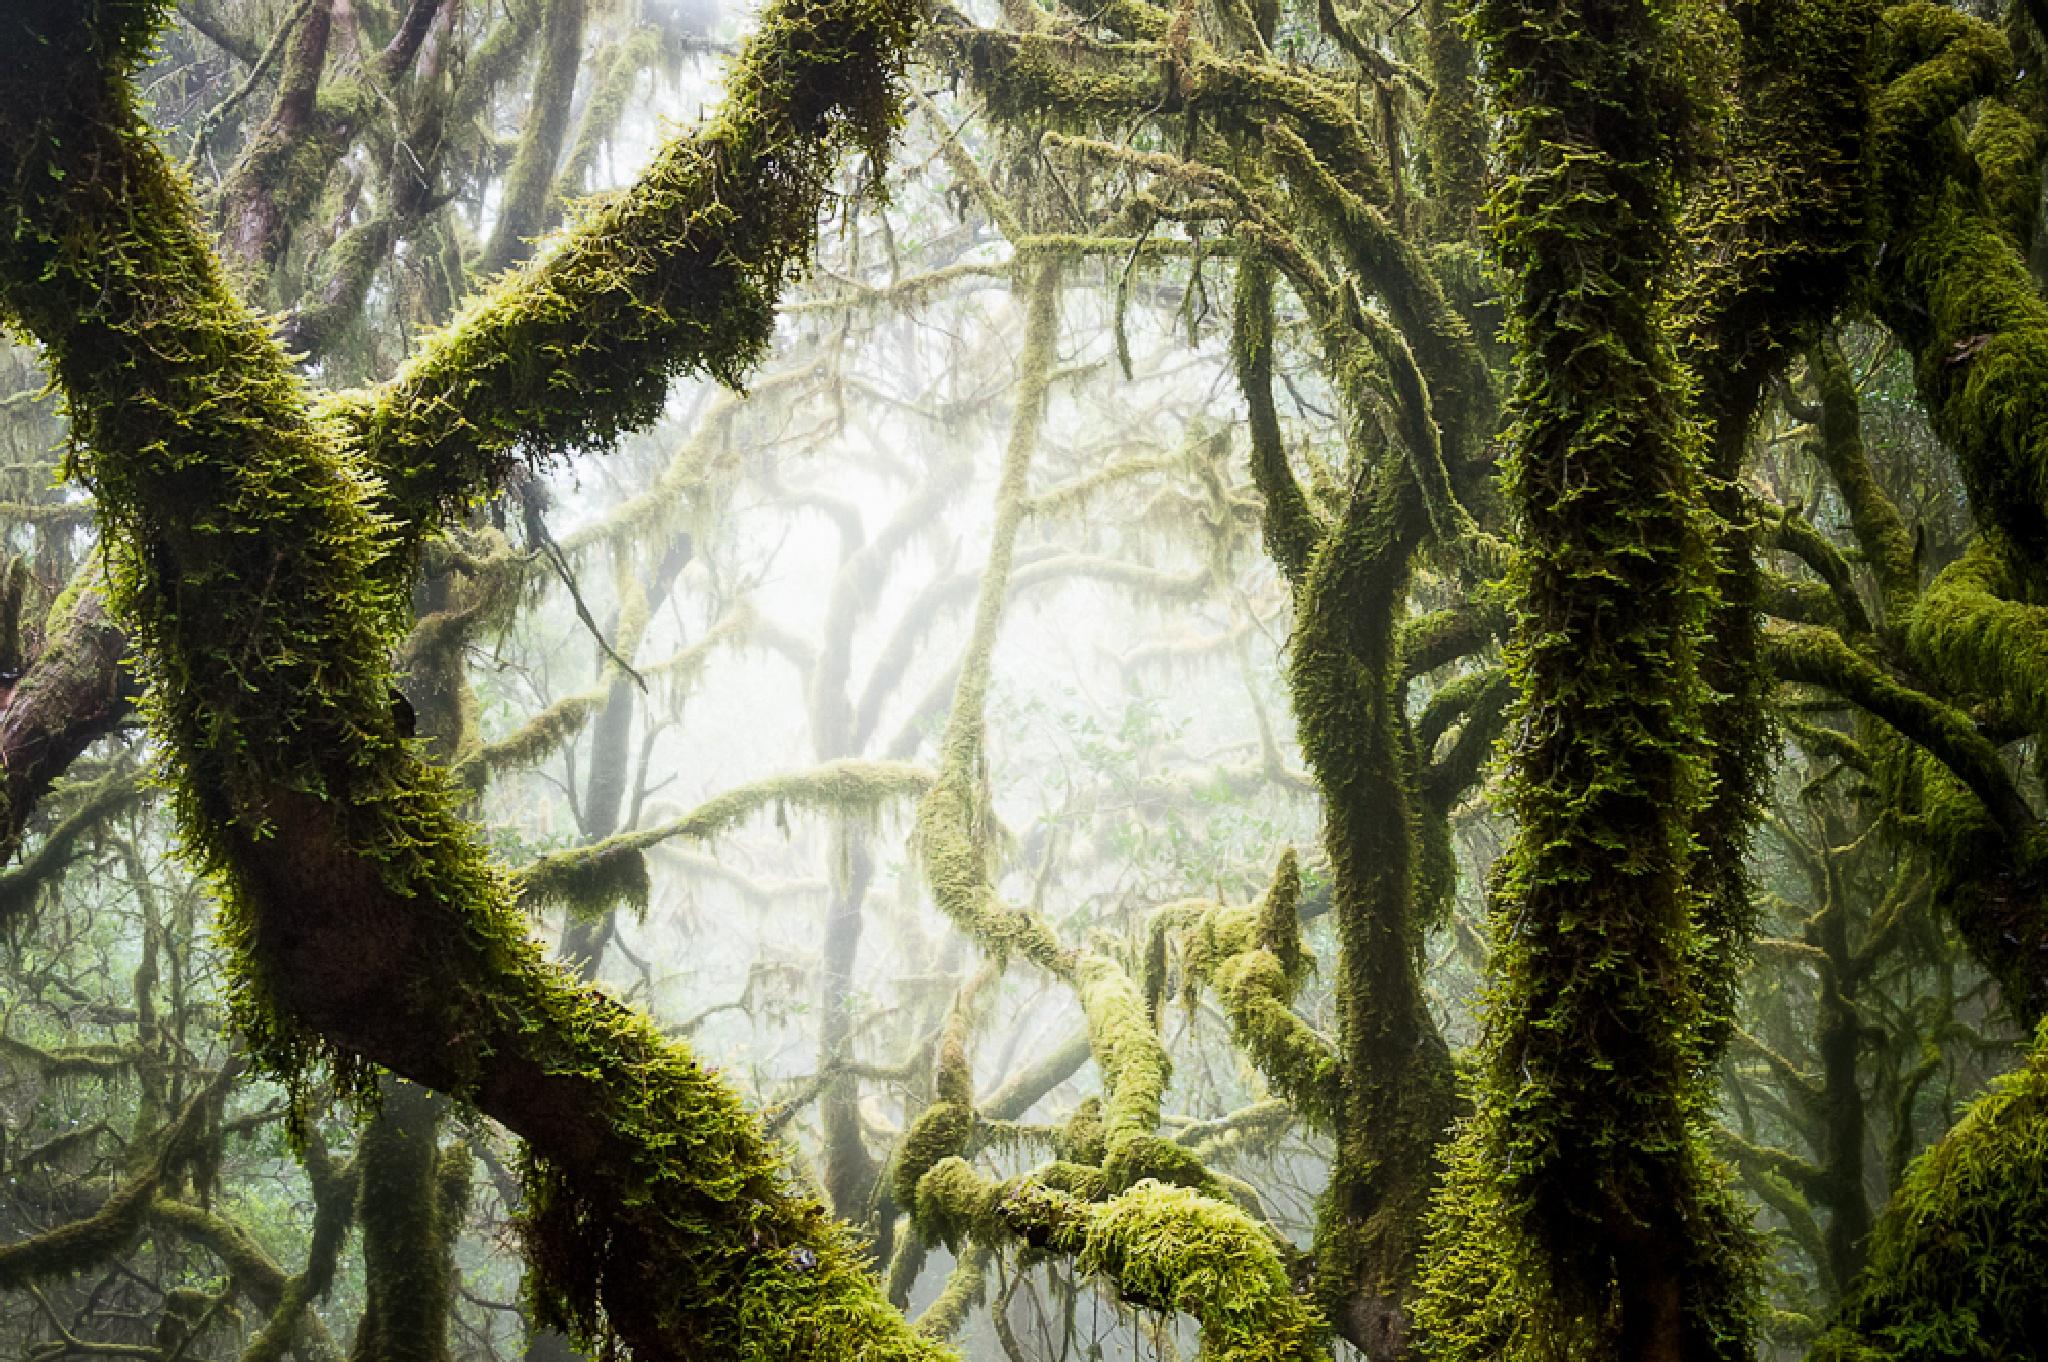 Nebelwald I by Michael Schlitter